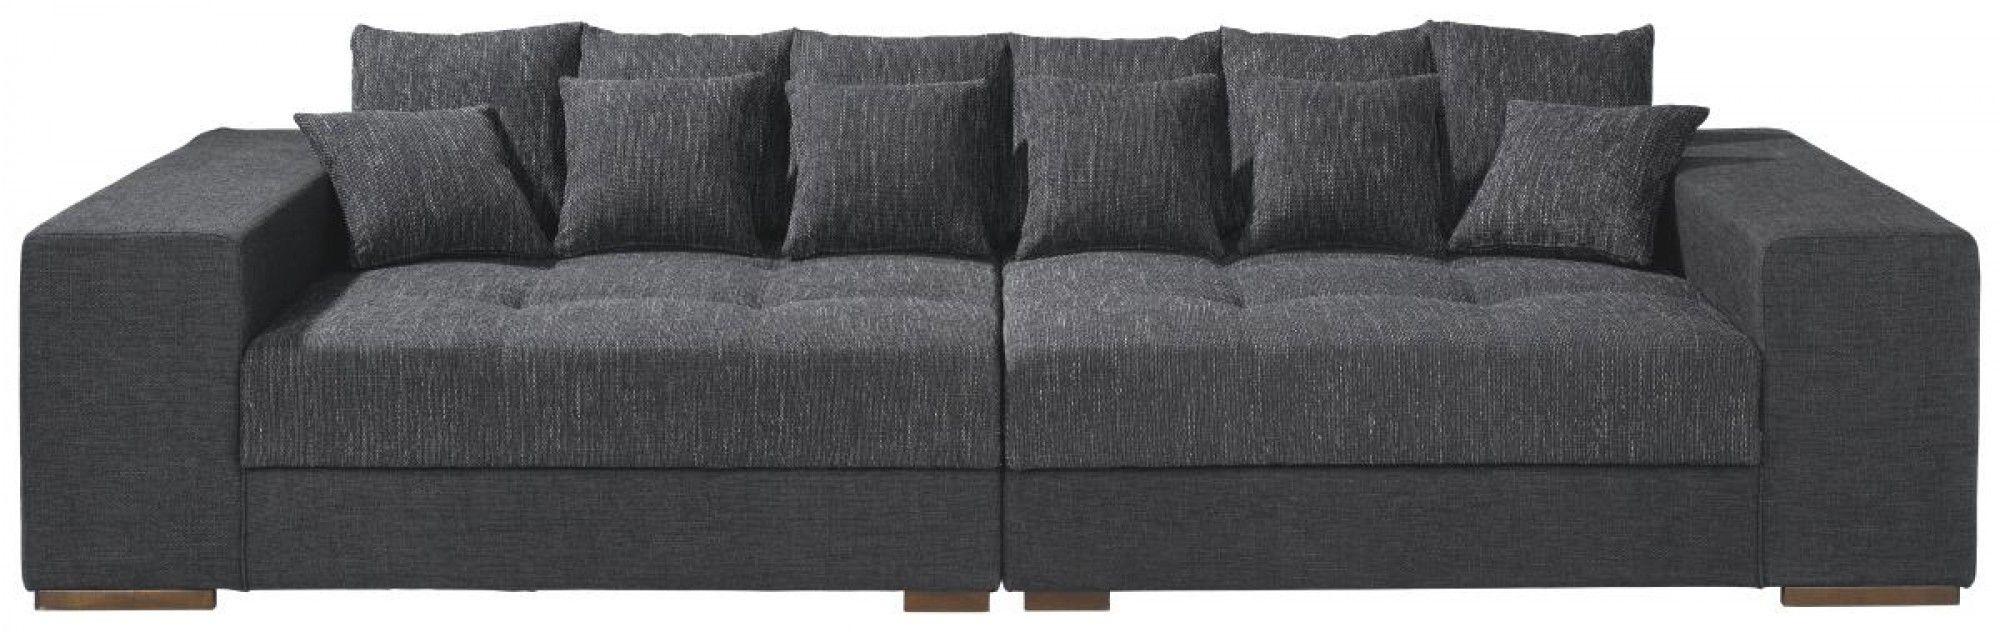 Klassisch Schlafcouch Poco Big Sofas Couch Sofa